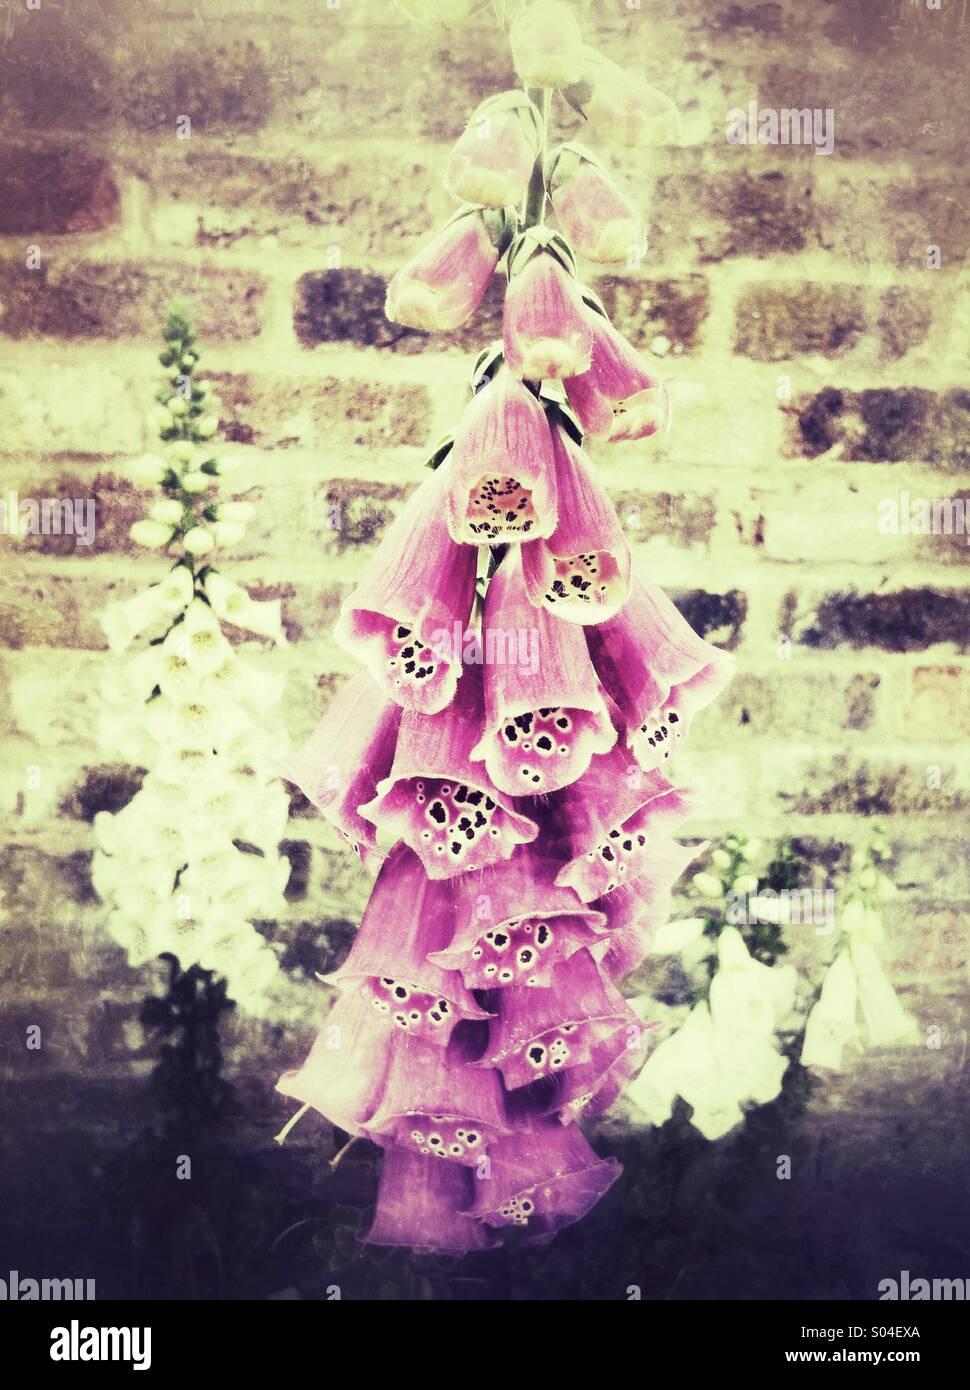 La digitale rose fleurs avec effet grunge Photo Stock